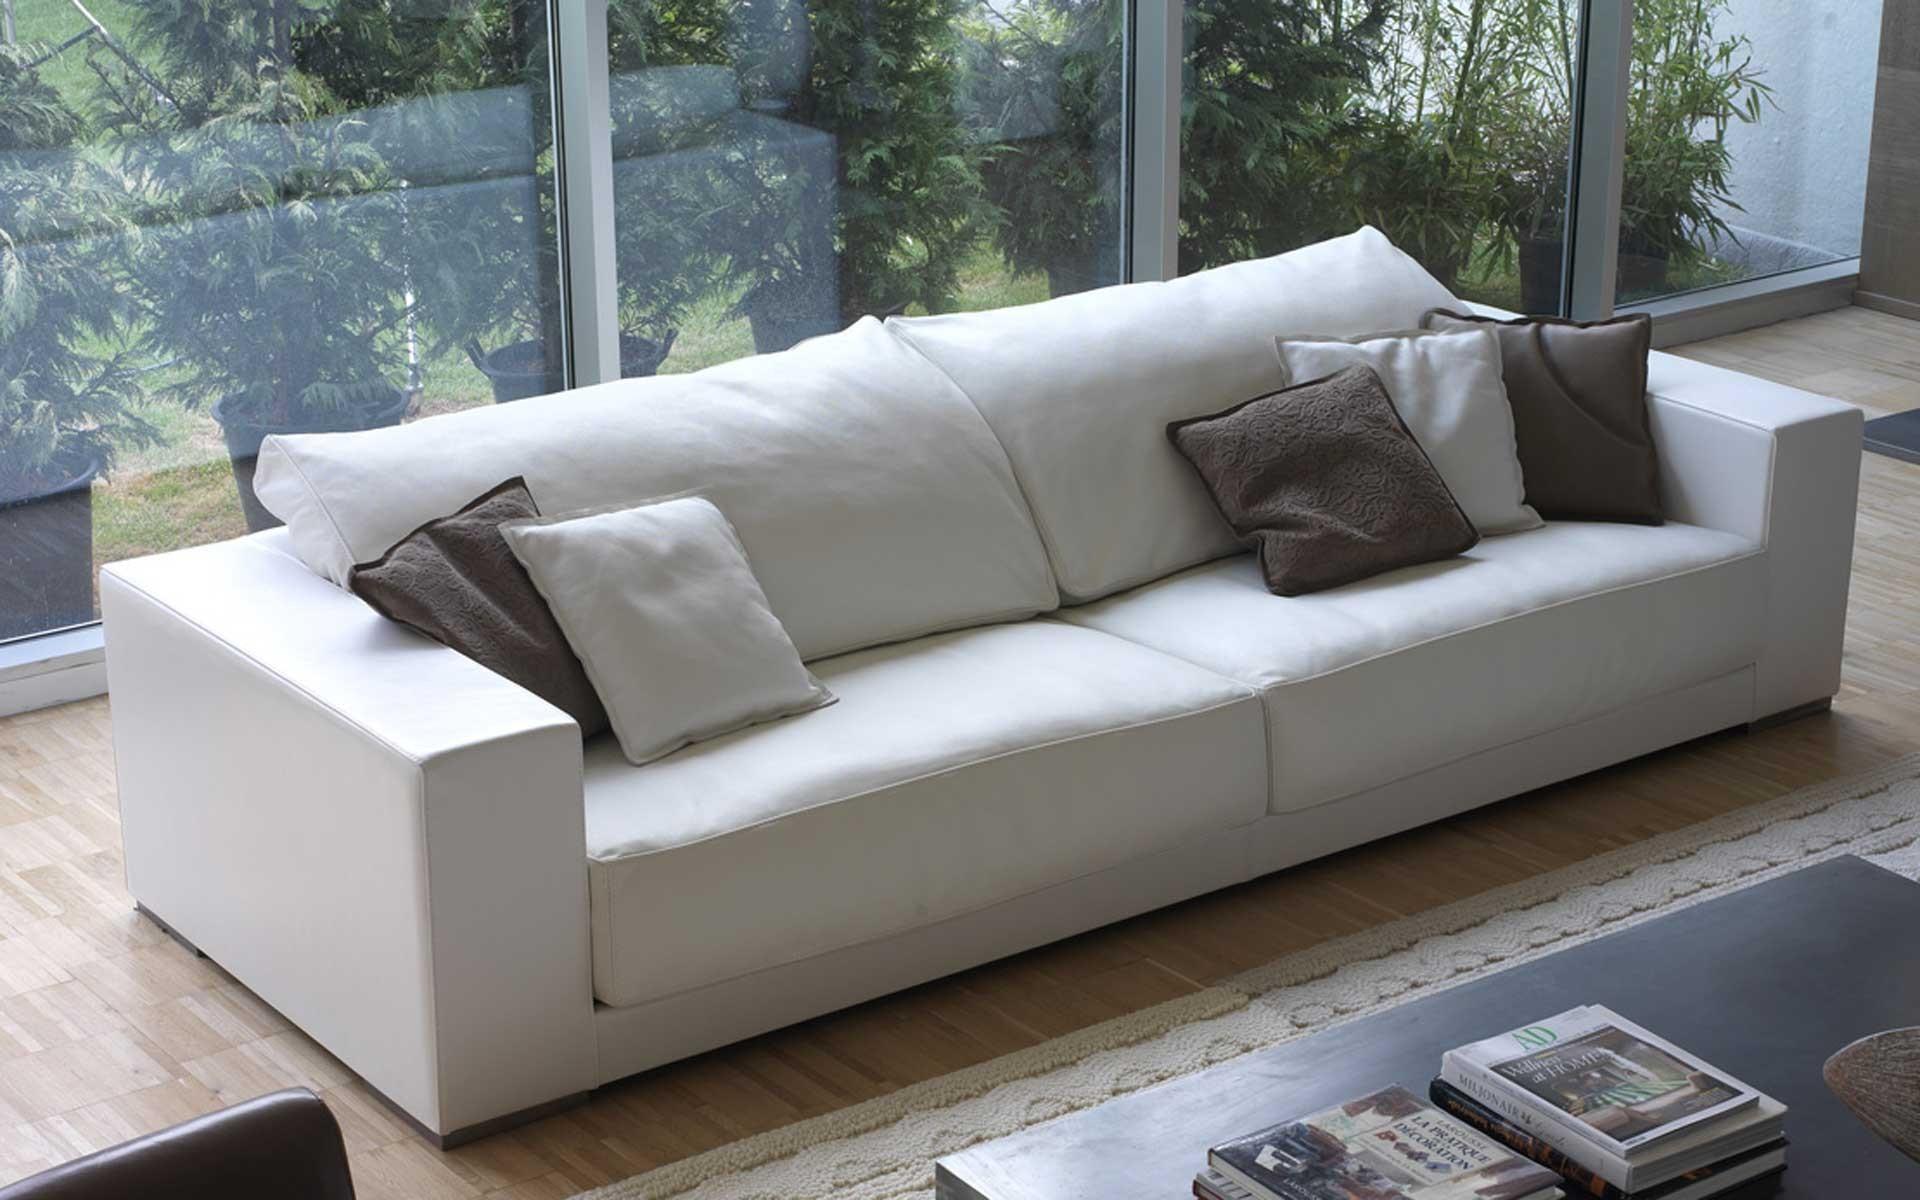 Baxter budapest sofa for Baxter budapest